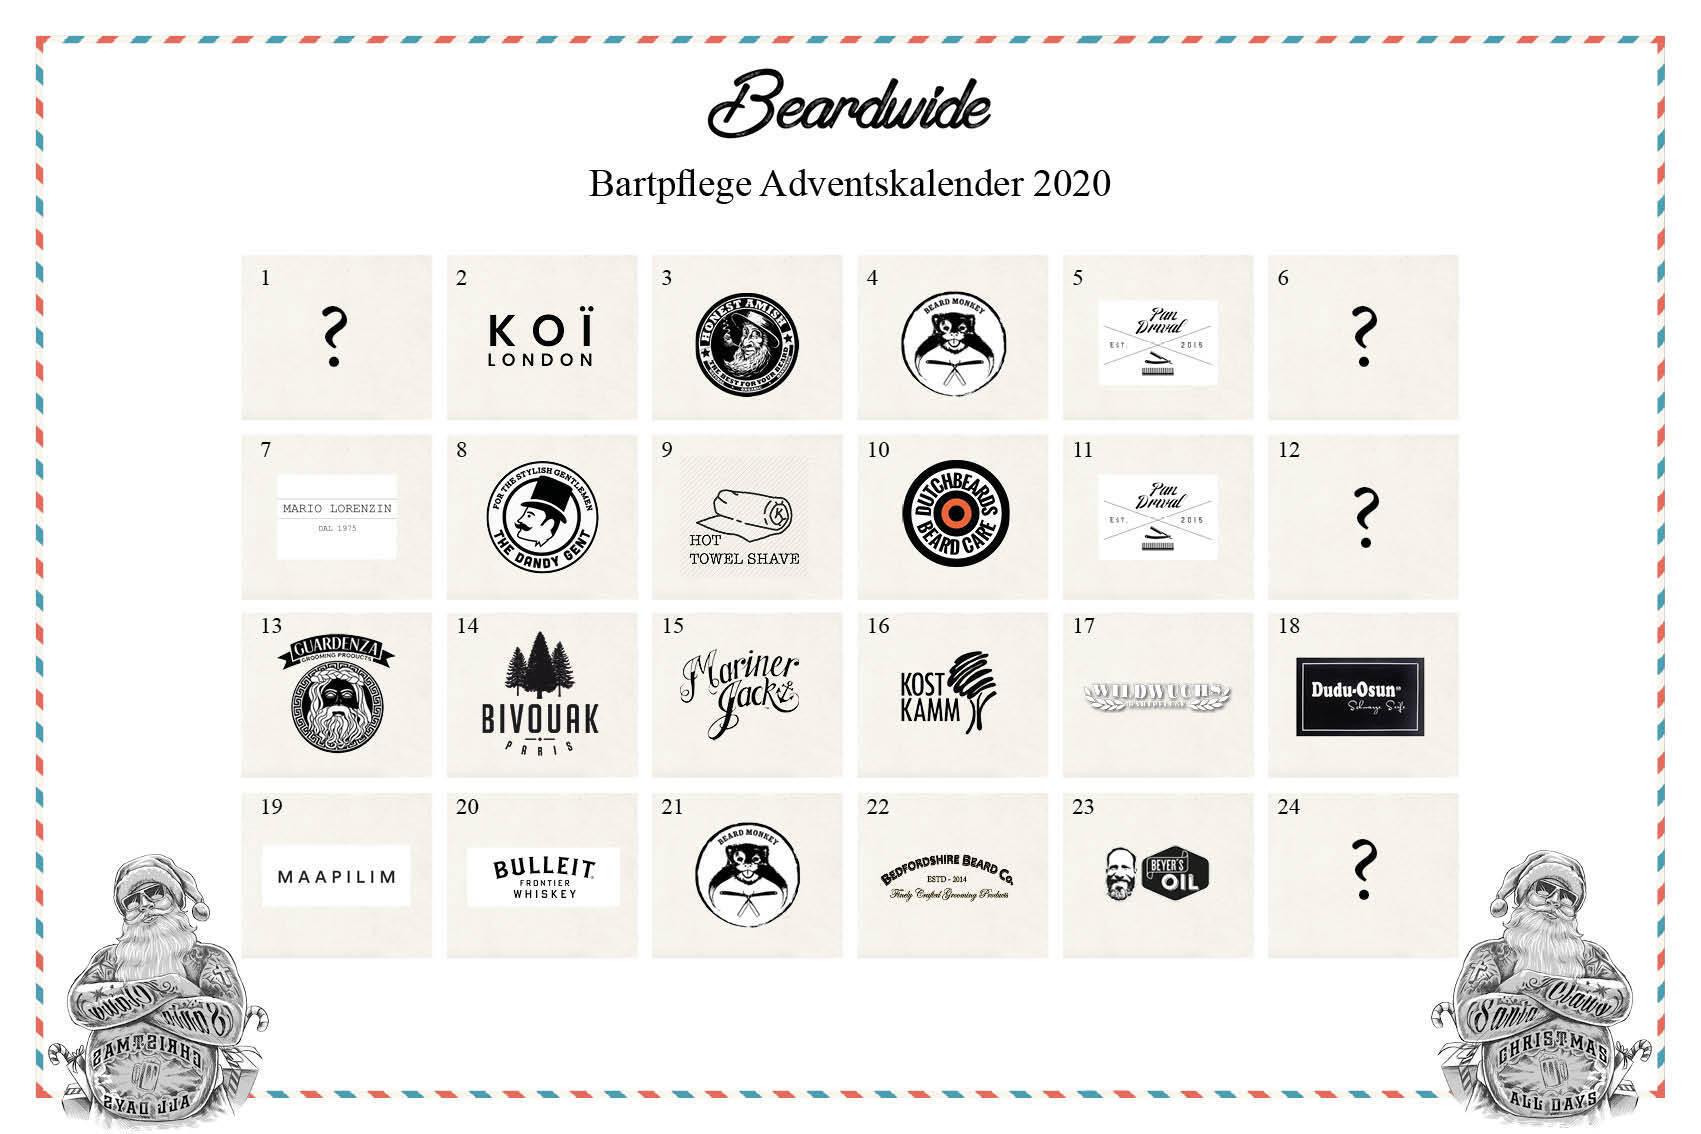 beardwide-bartpflege-adventskalenderQSRDqPqKC8PzC